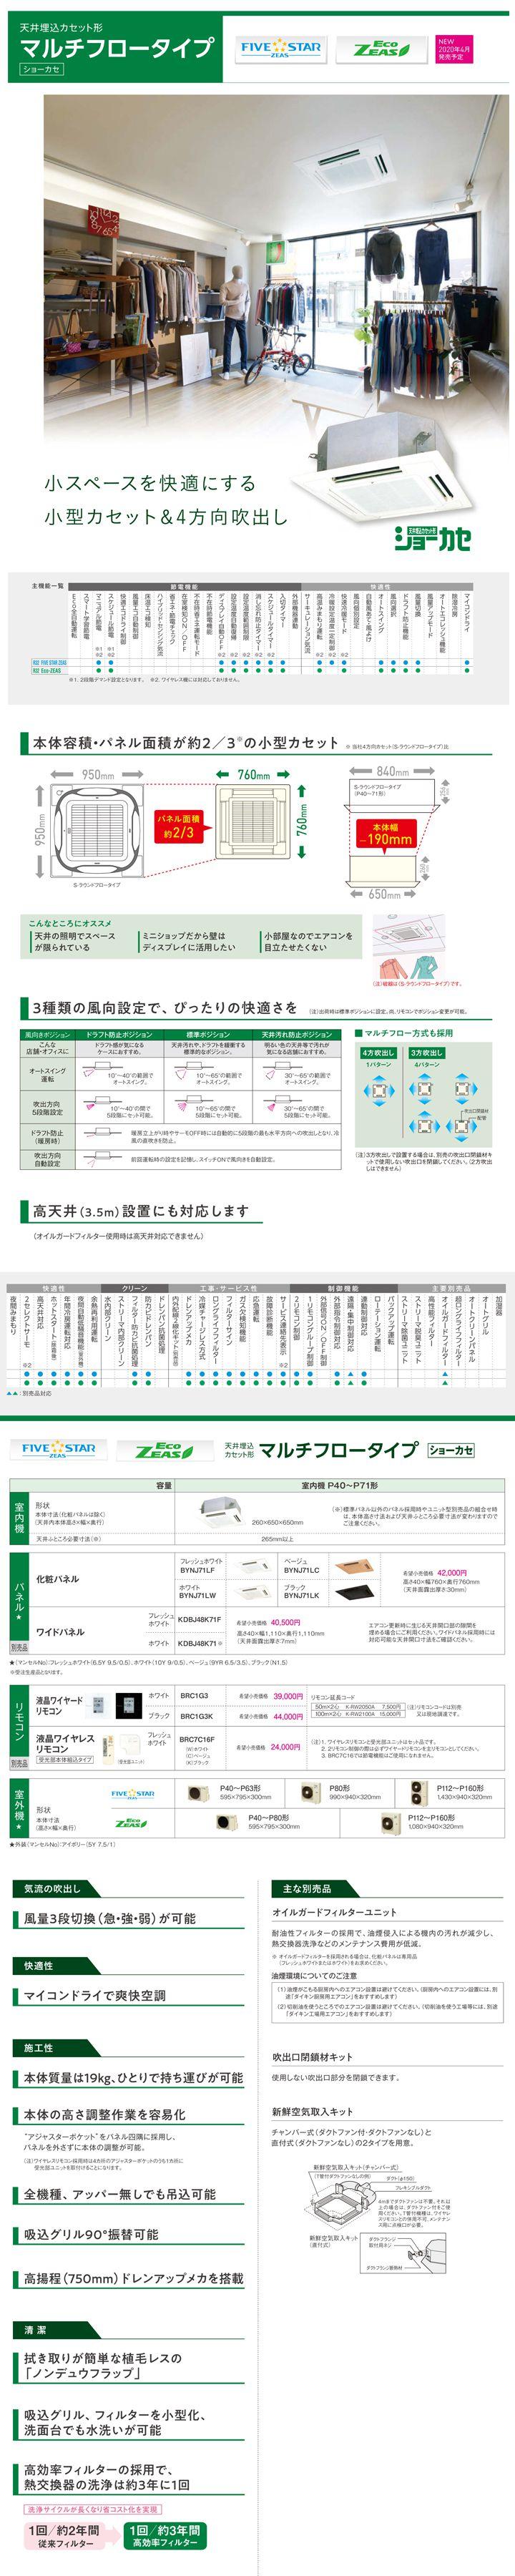 SSRN140BFNDカタログ